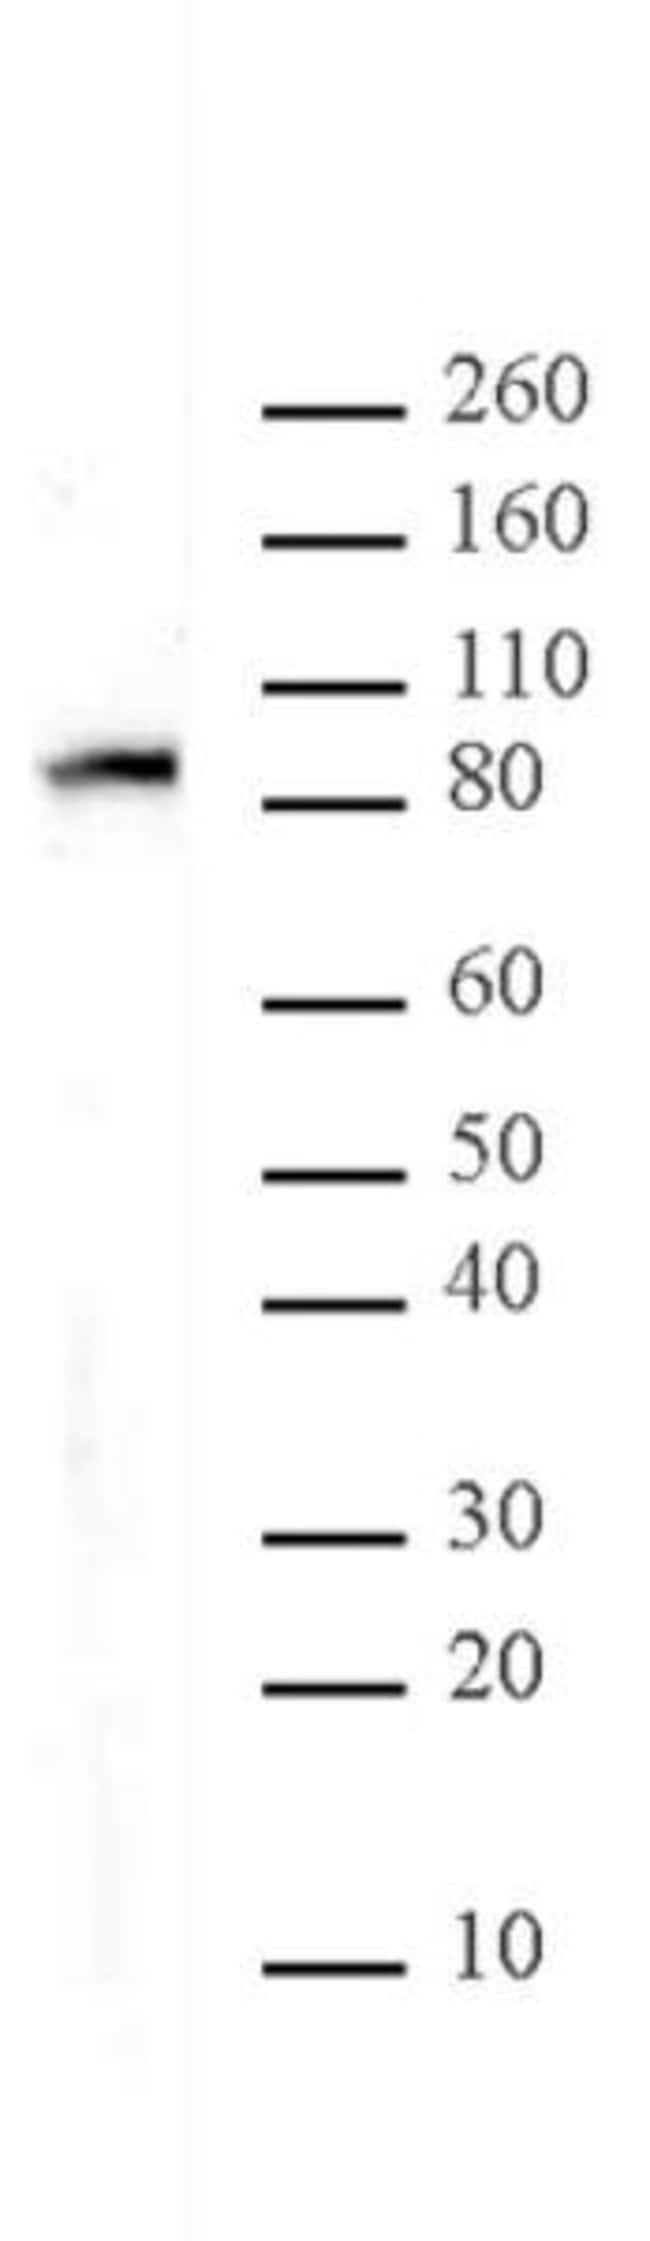 MALT1 Mouse anti-Human, Active Motif:Antibodies:Primary Antibodies